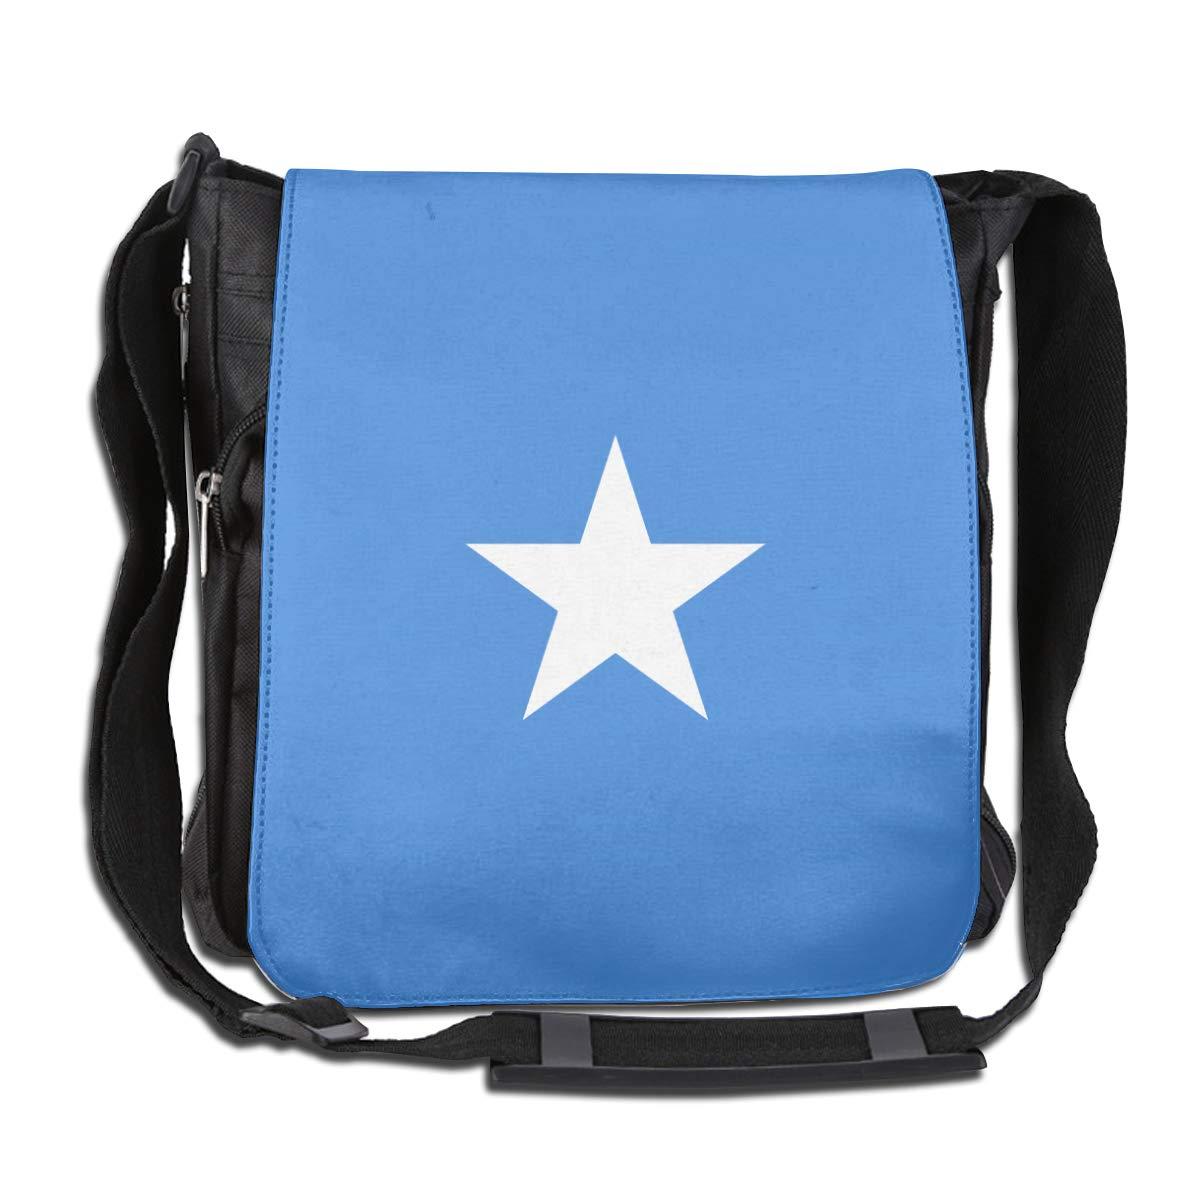 Somalia Flag Men Women Classic Satchel Messenger Bags Crossbody Sling Working Bag Travel Shoulder Bags Office//School